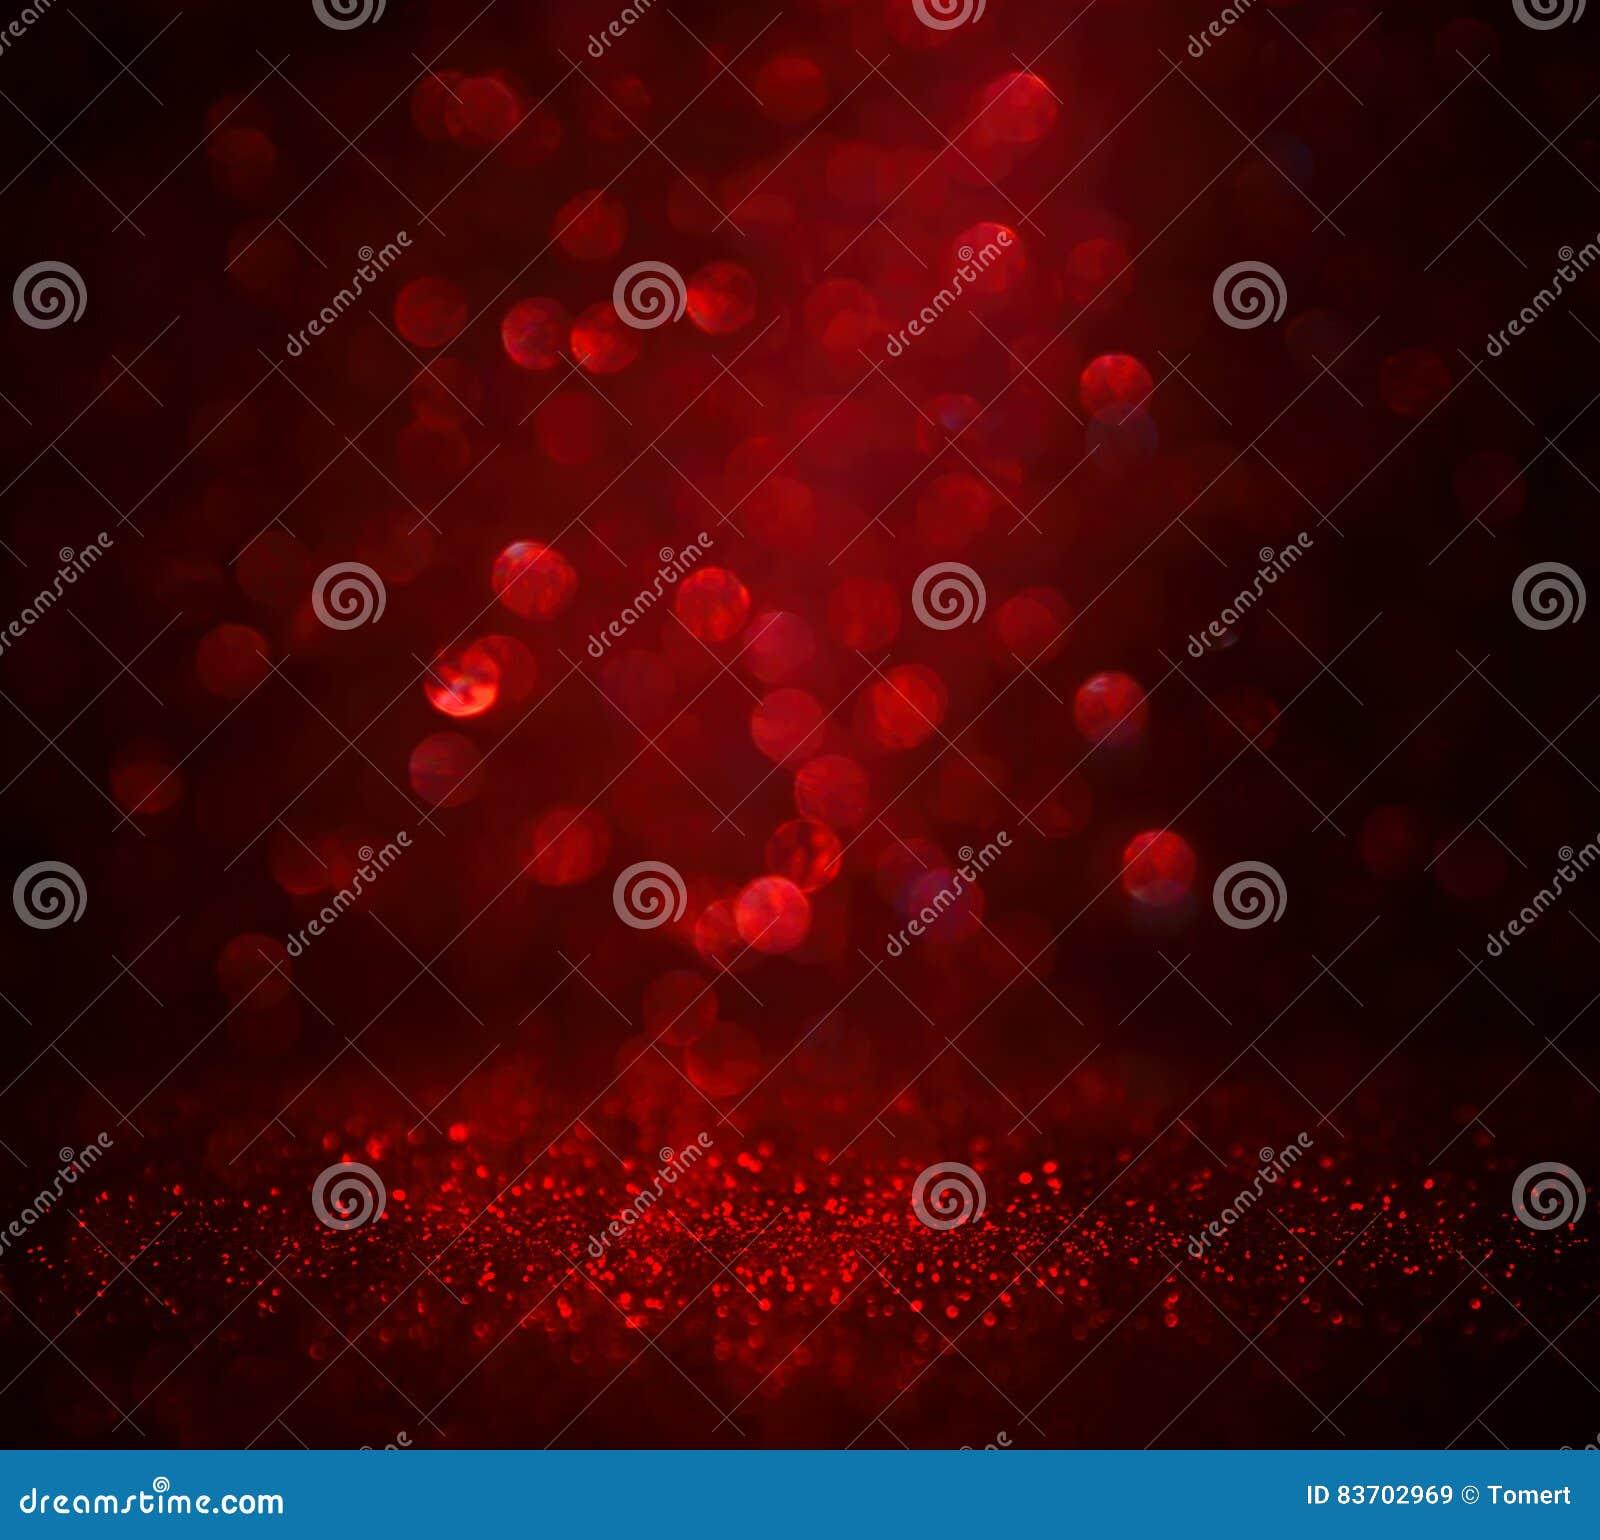 Red Glitter Vintage Lights Background Stock Photo